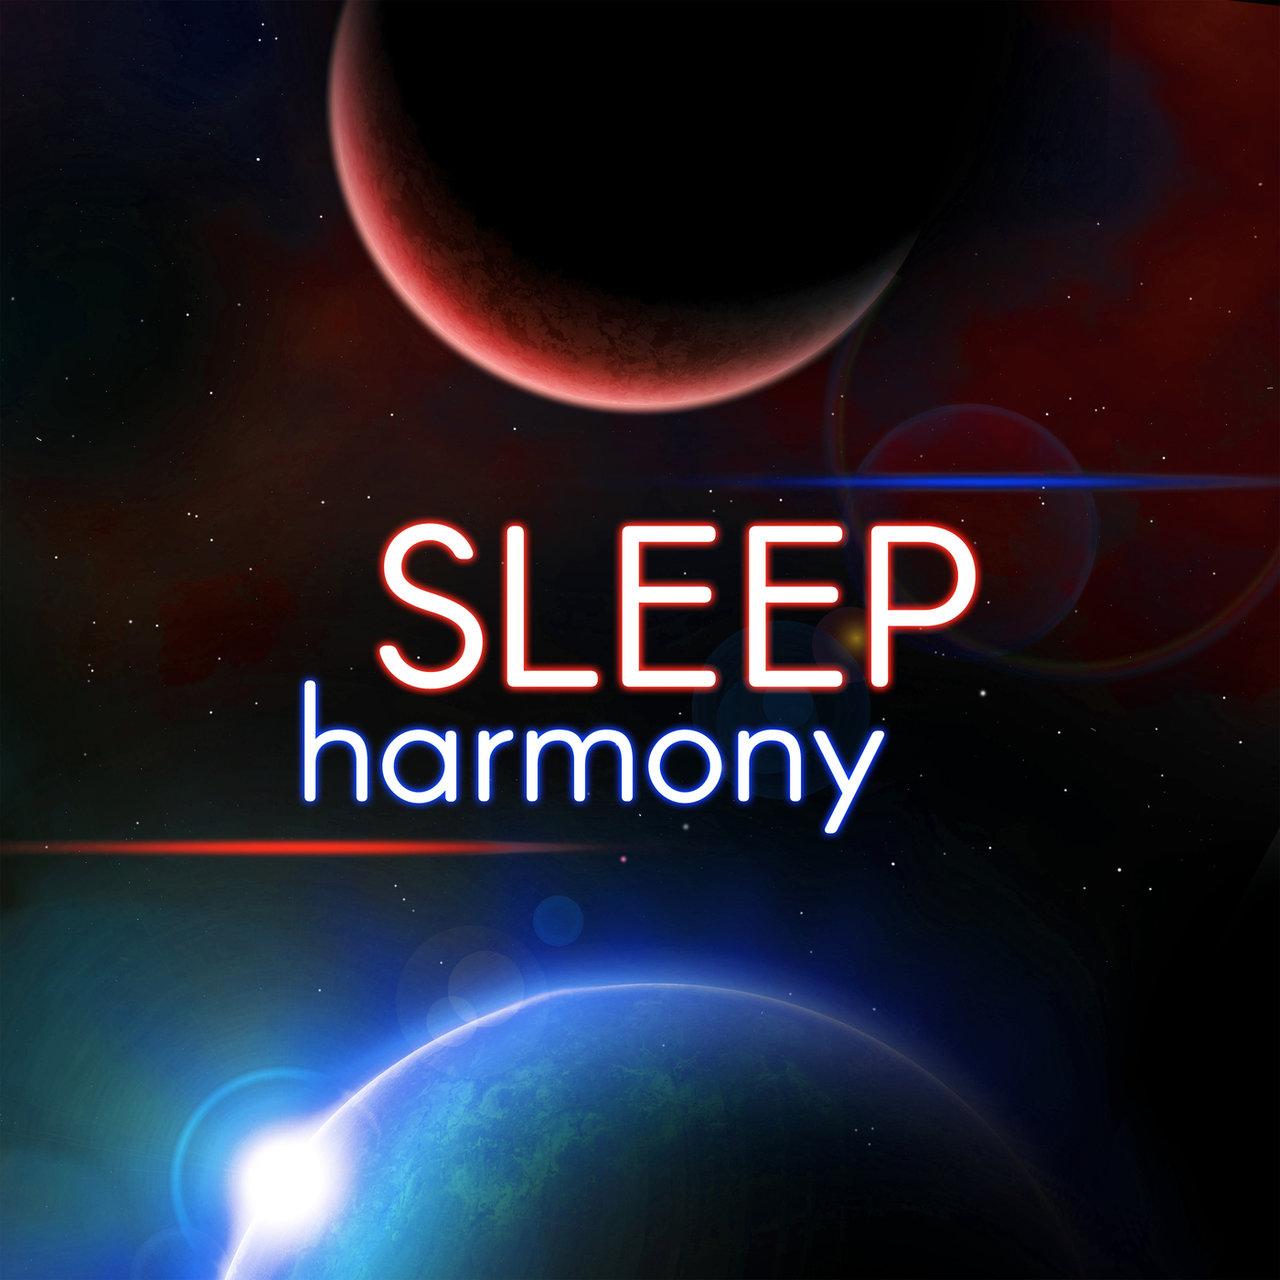 Sleep Harmony Sleep Music To Help You Fall Asleep Easily, Natural Music For  Healing Through